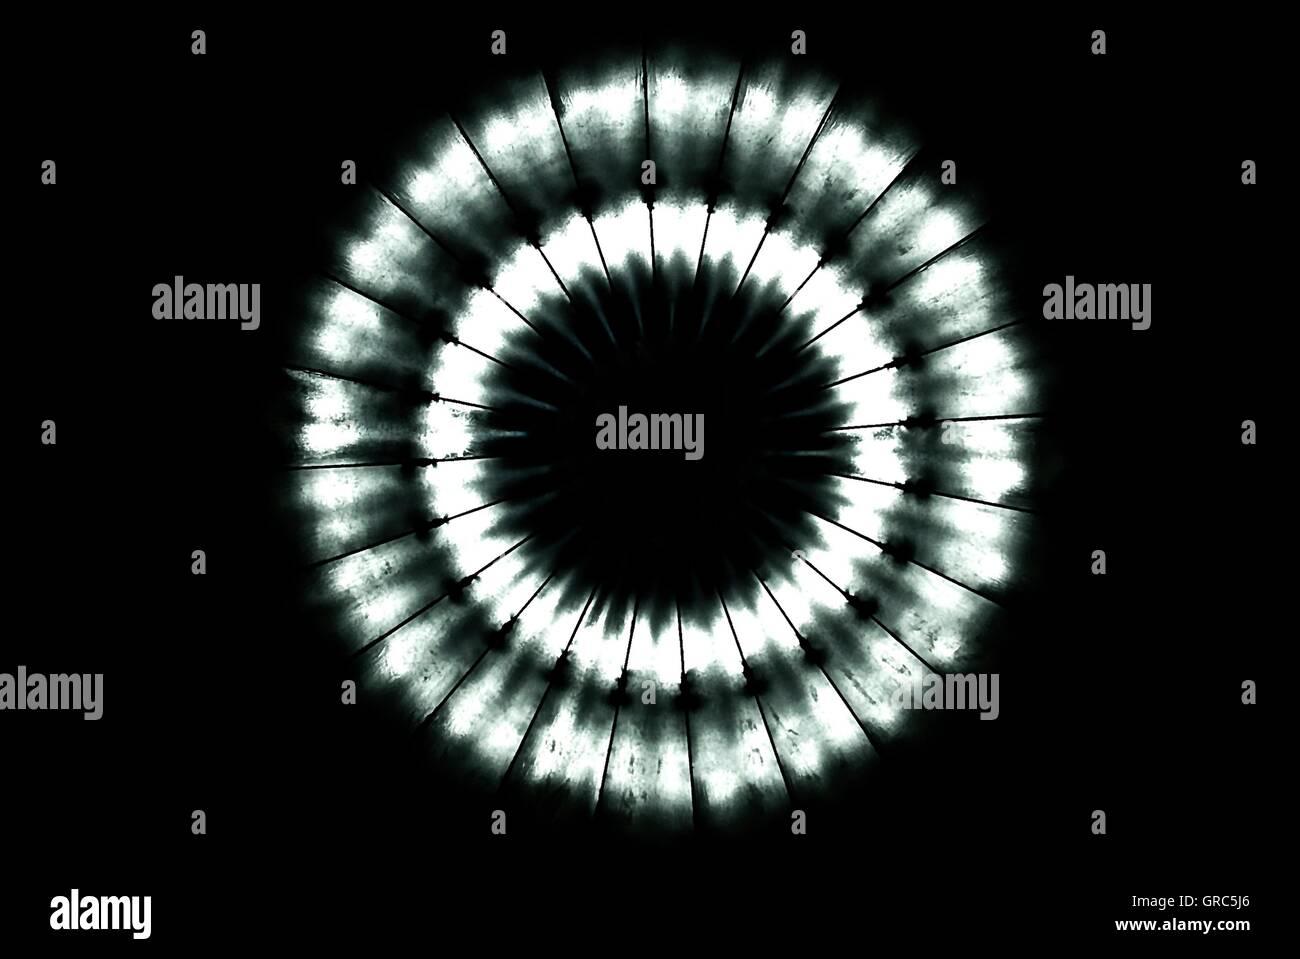 Circle Of Light - Stock Image